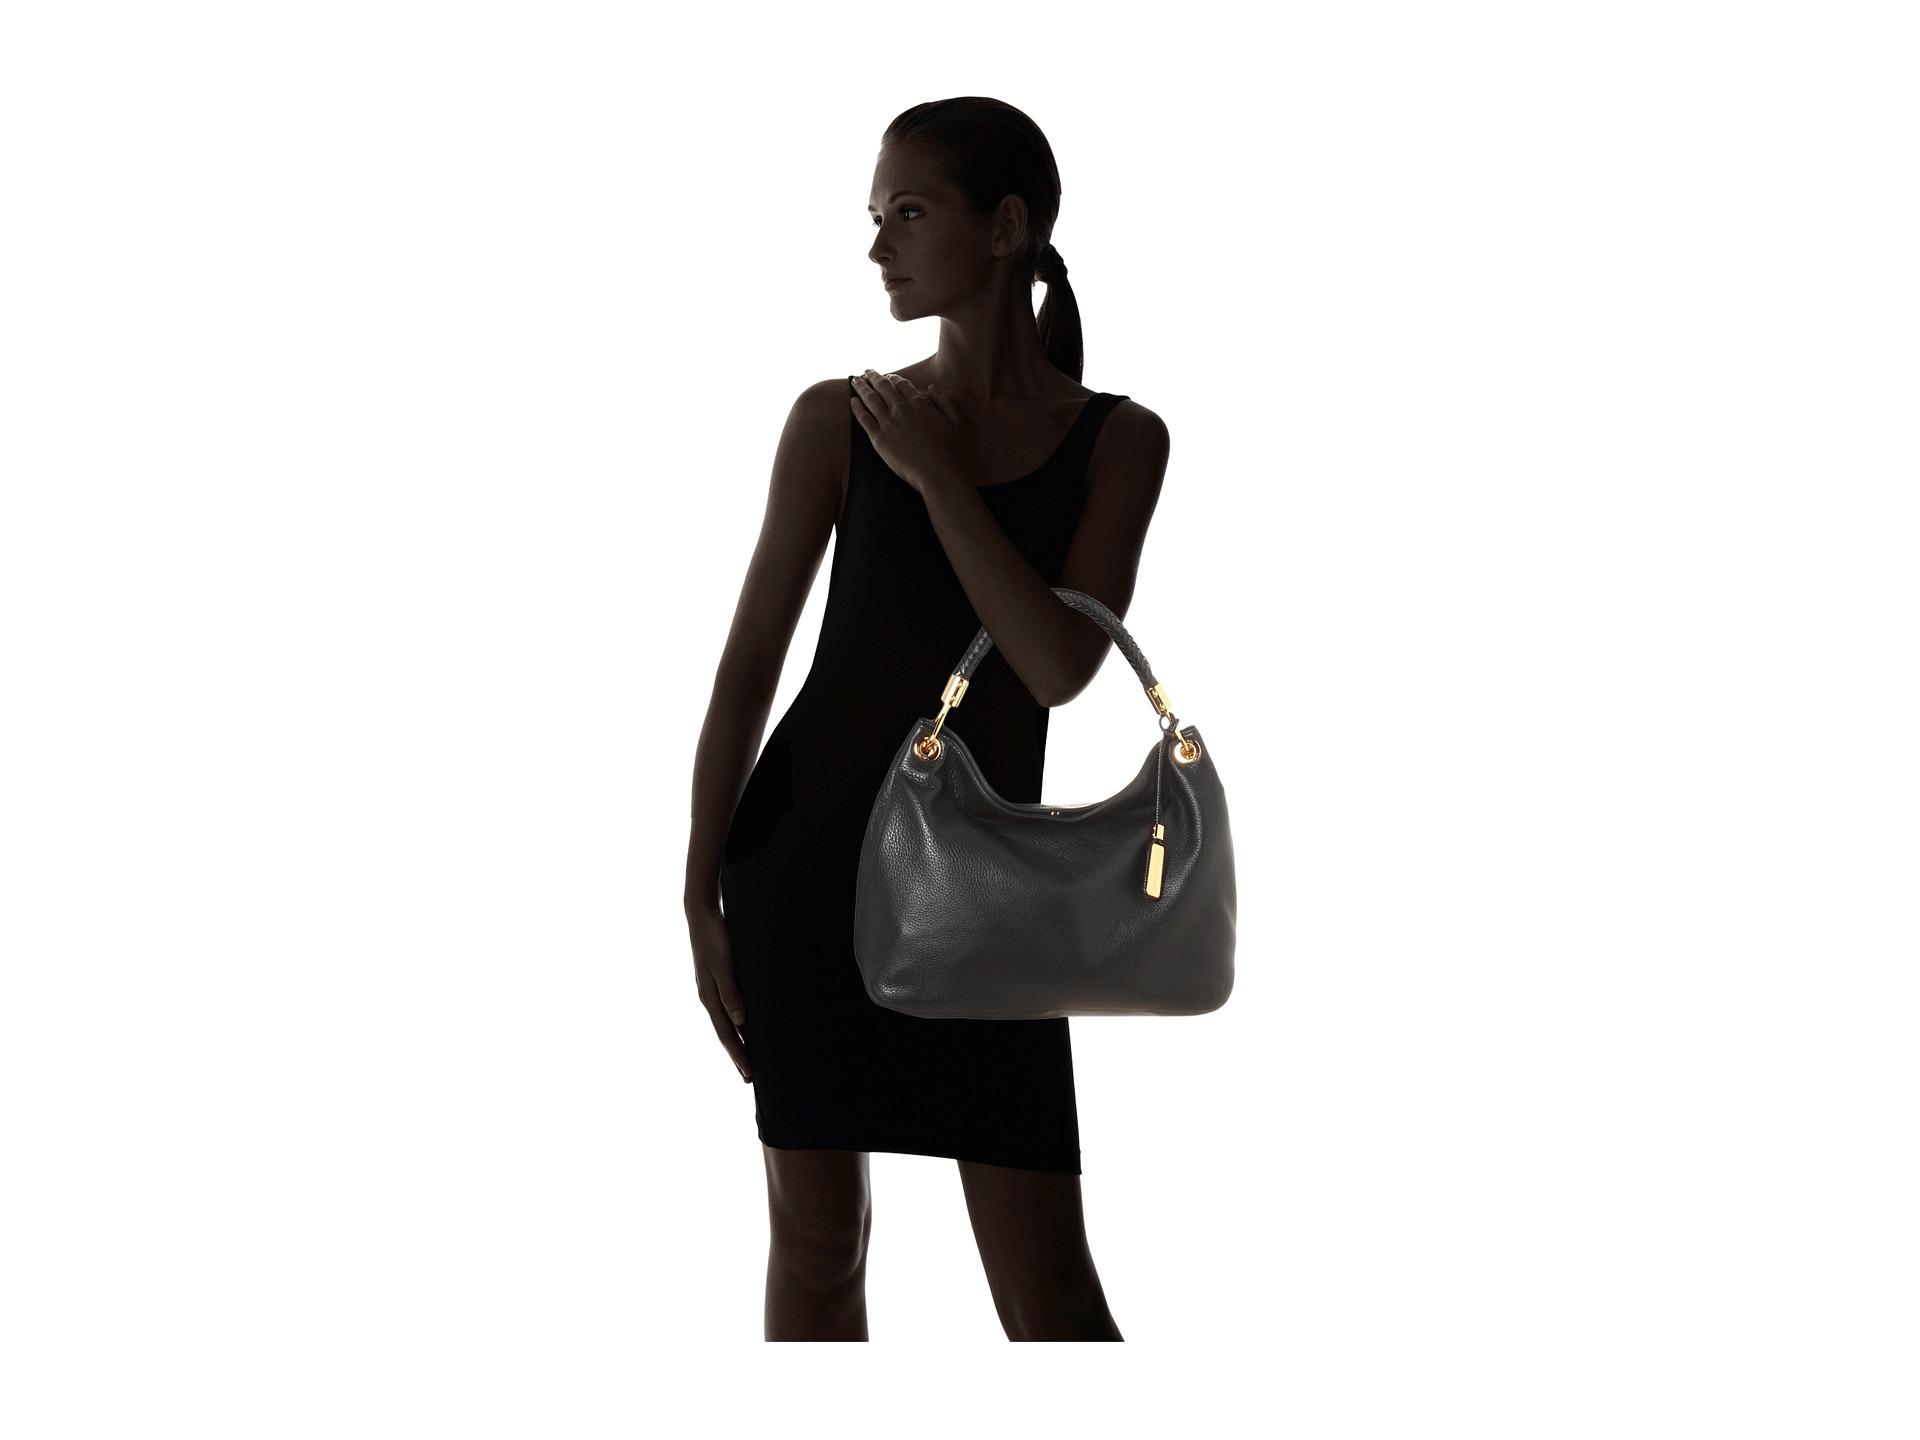 Promo Code For Michael Kors Skorpios Shoulder - Michael Kors Skorpios Large Shoulder Bag